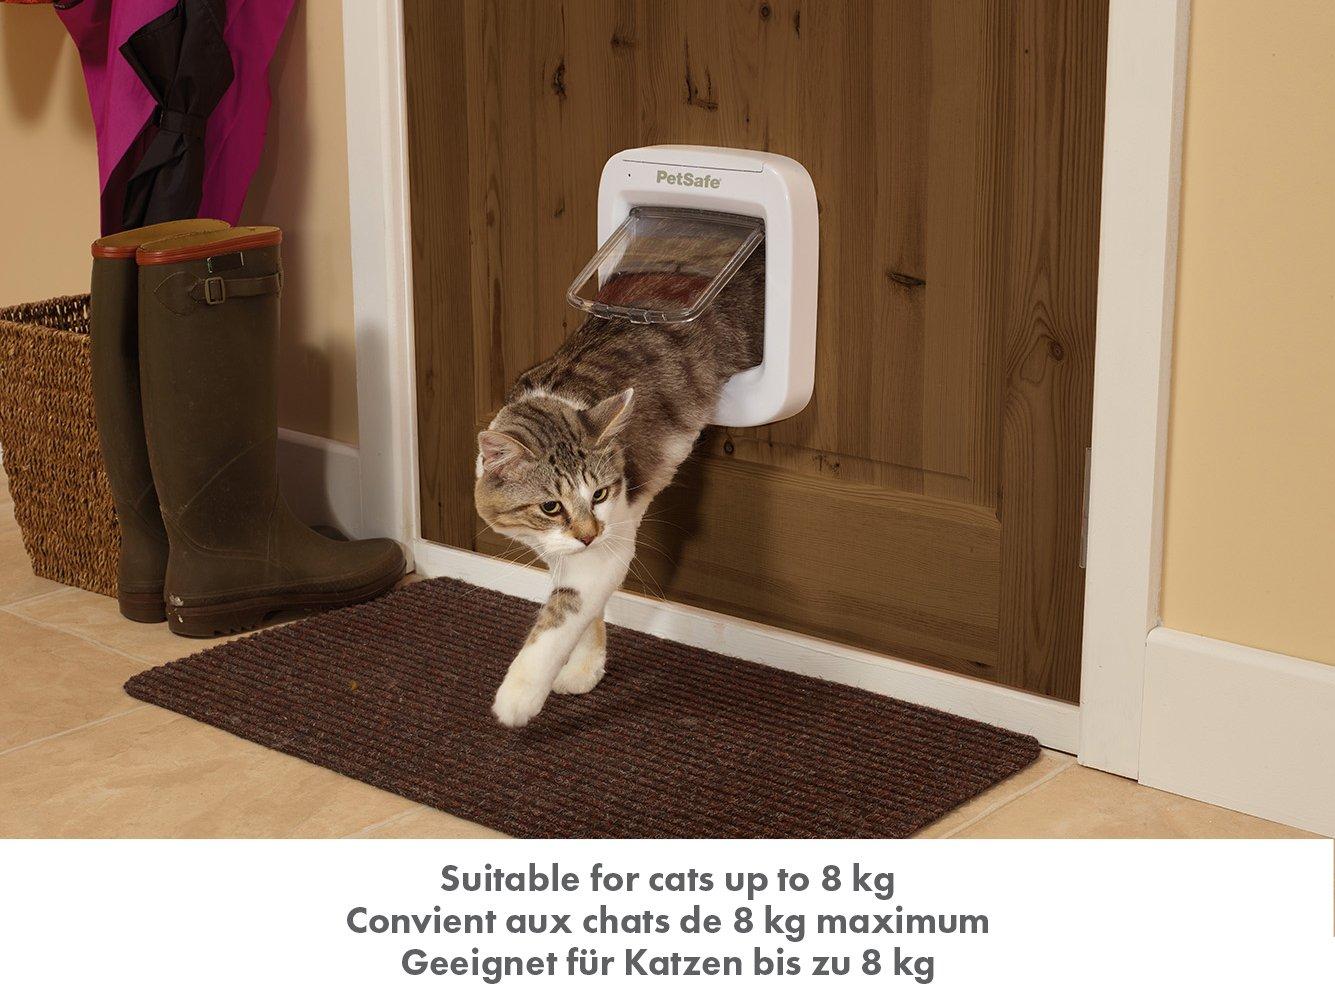 PetSafe Puerta para Gatos con Microchip